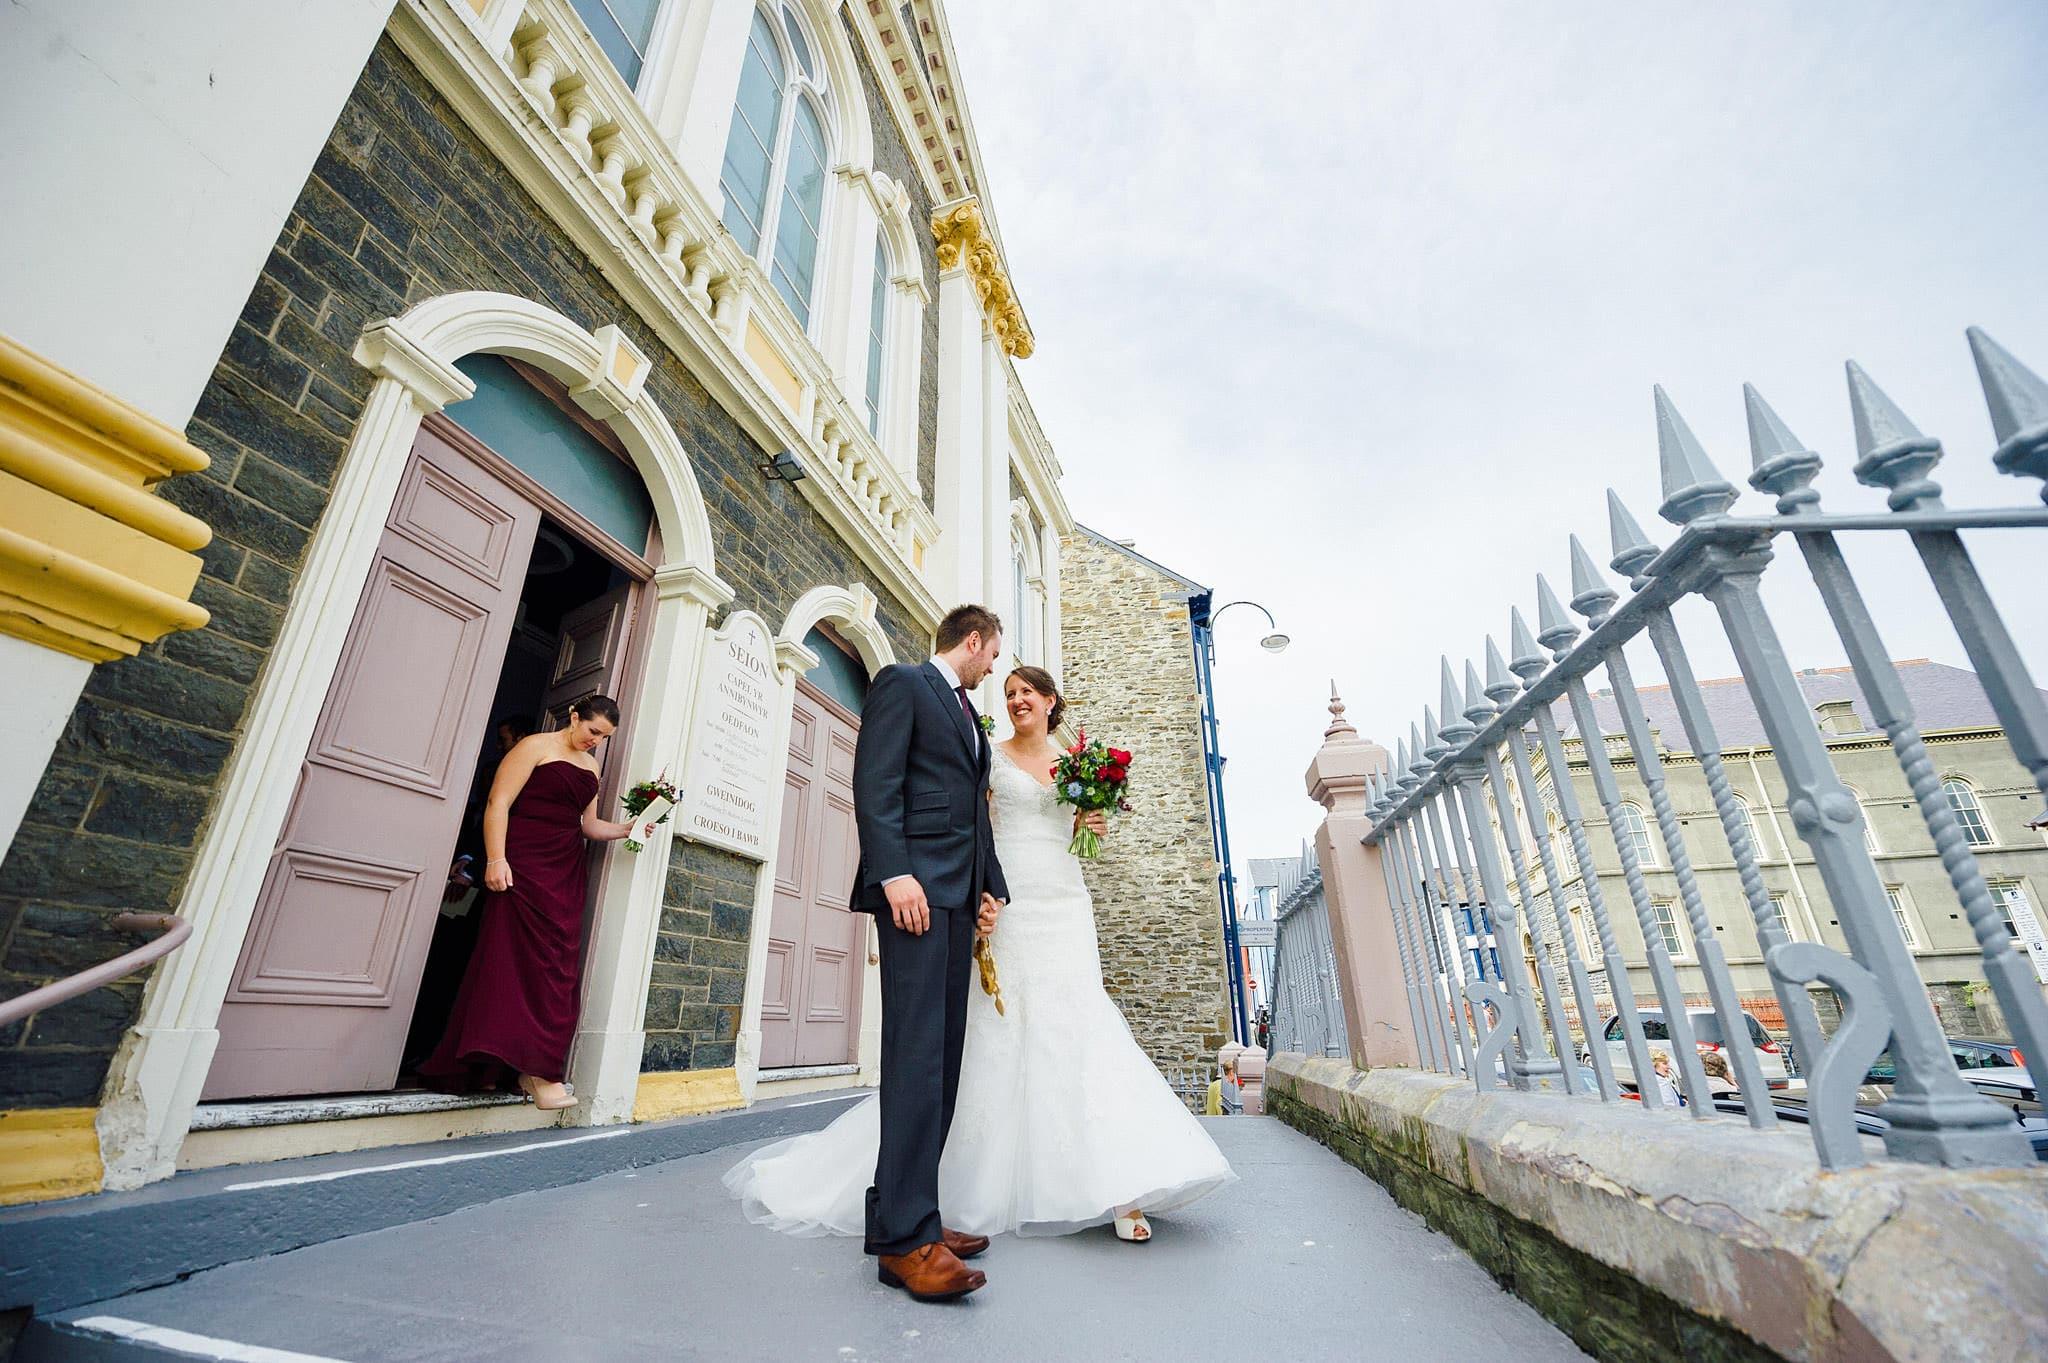 wedding-photographer-aberystwyth-wales (64)